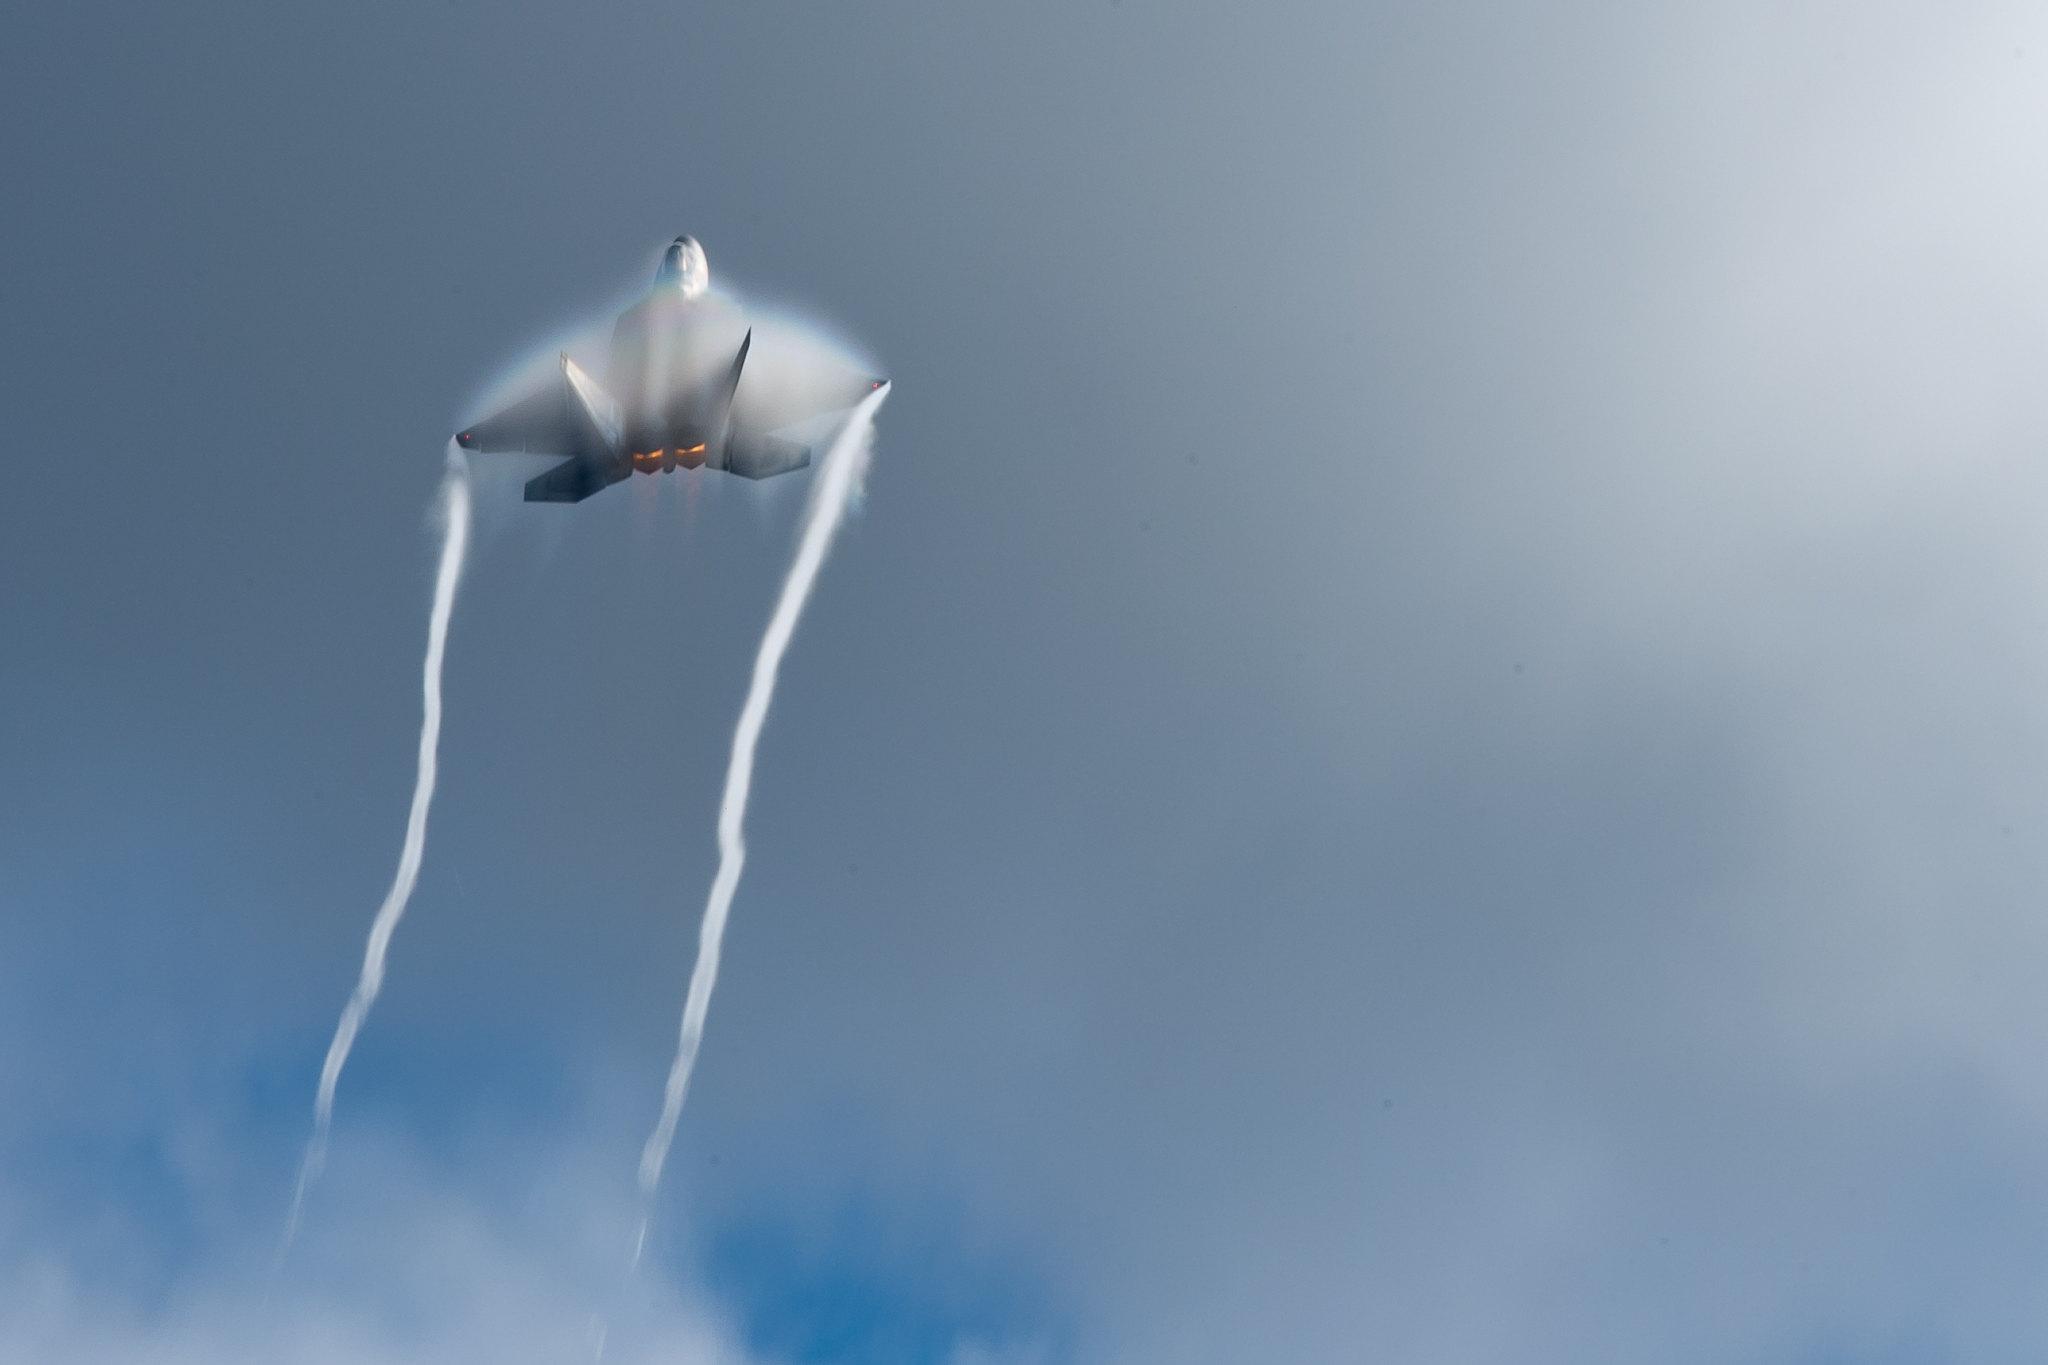 F-22 flys at Artctic Thunder